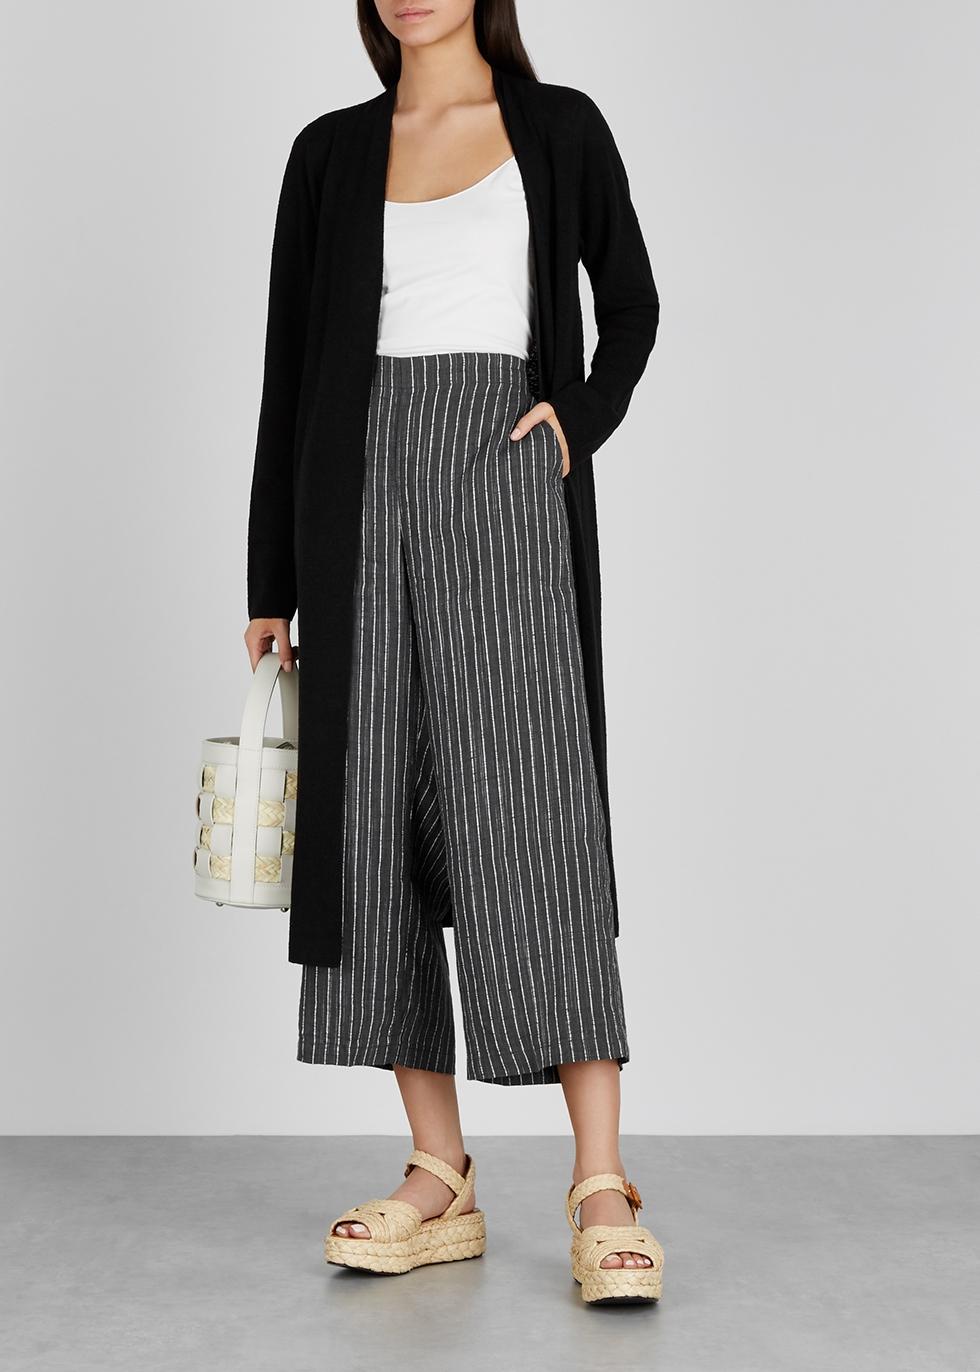 Grey striped wide-leg linen culottes - EILEEN FISHER